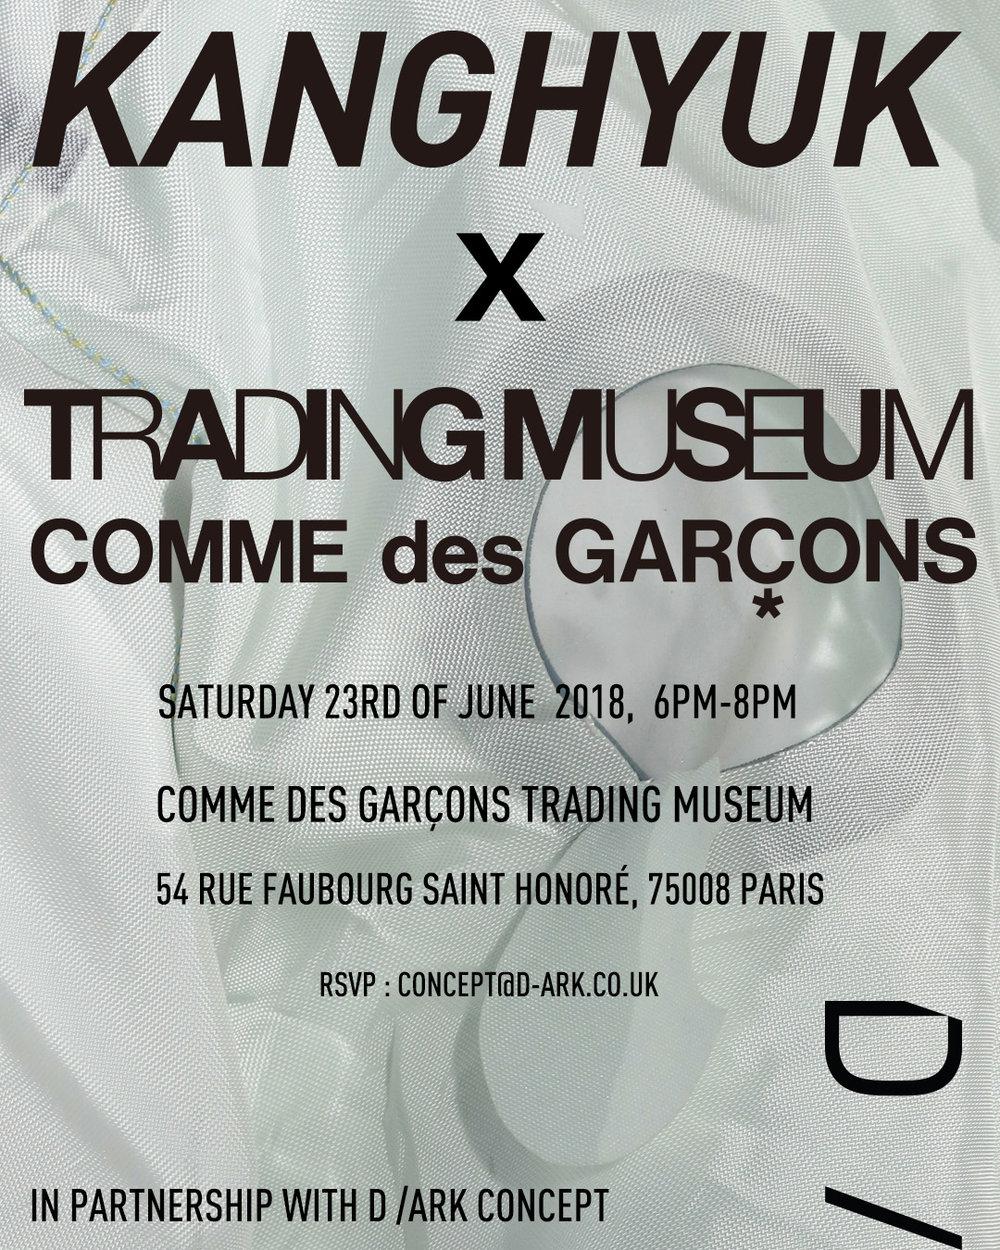 KANGHYUK x COMME DES GARÇONS TRADING MUSEUM INVITATION VERSION D_ARK.jpg